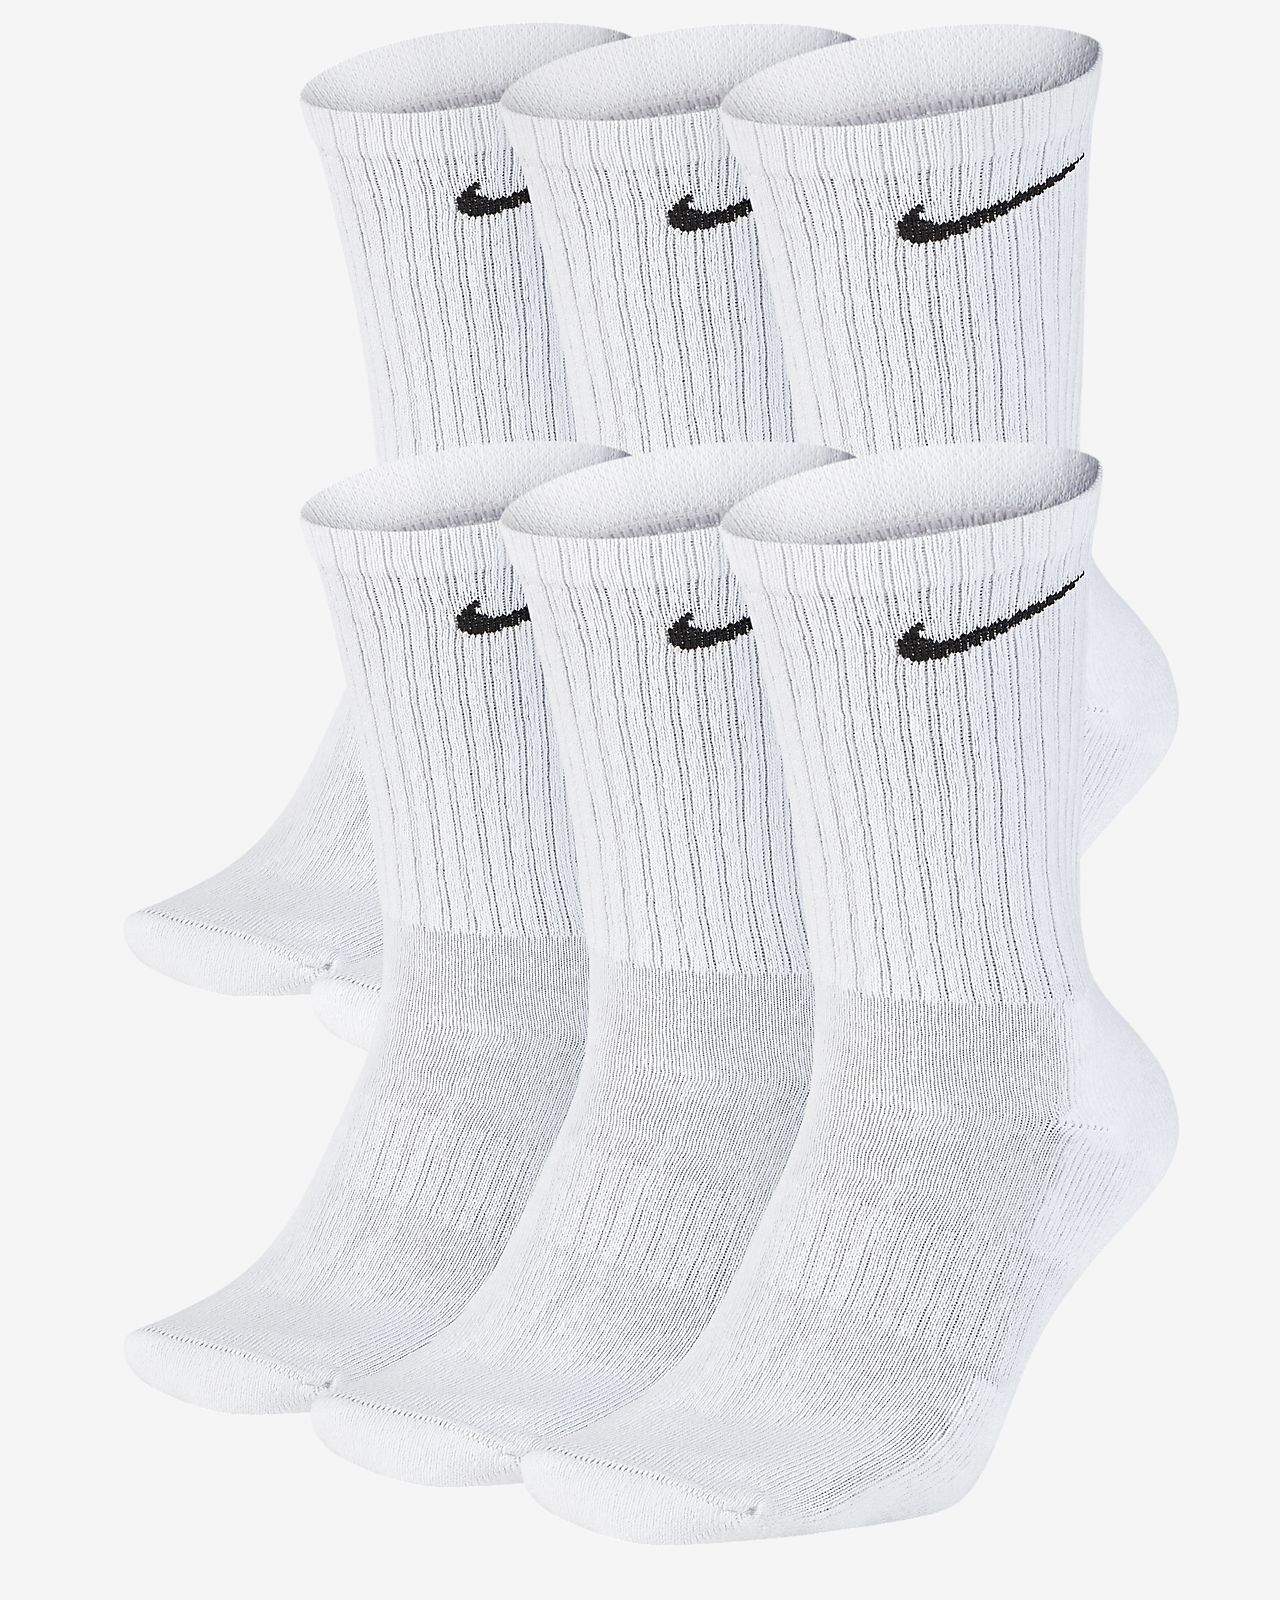 Nike Dri Fit Cushioned Crew Training Socks